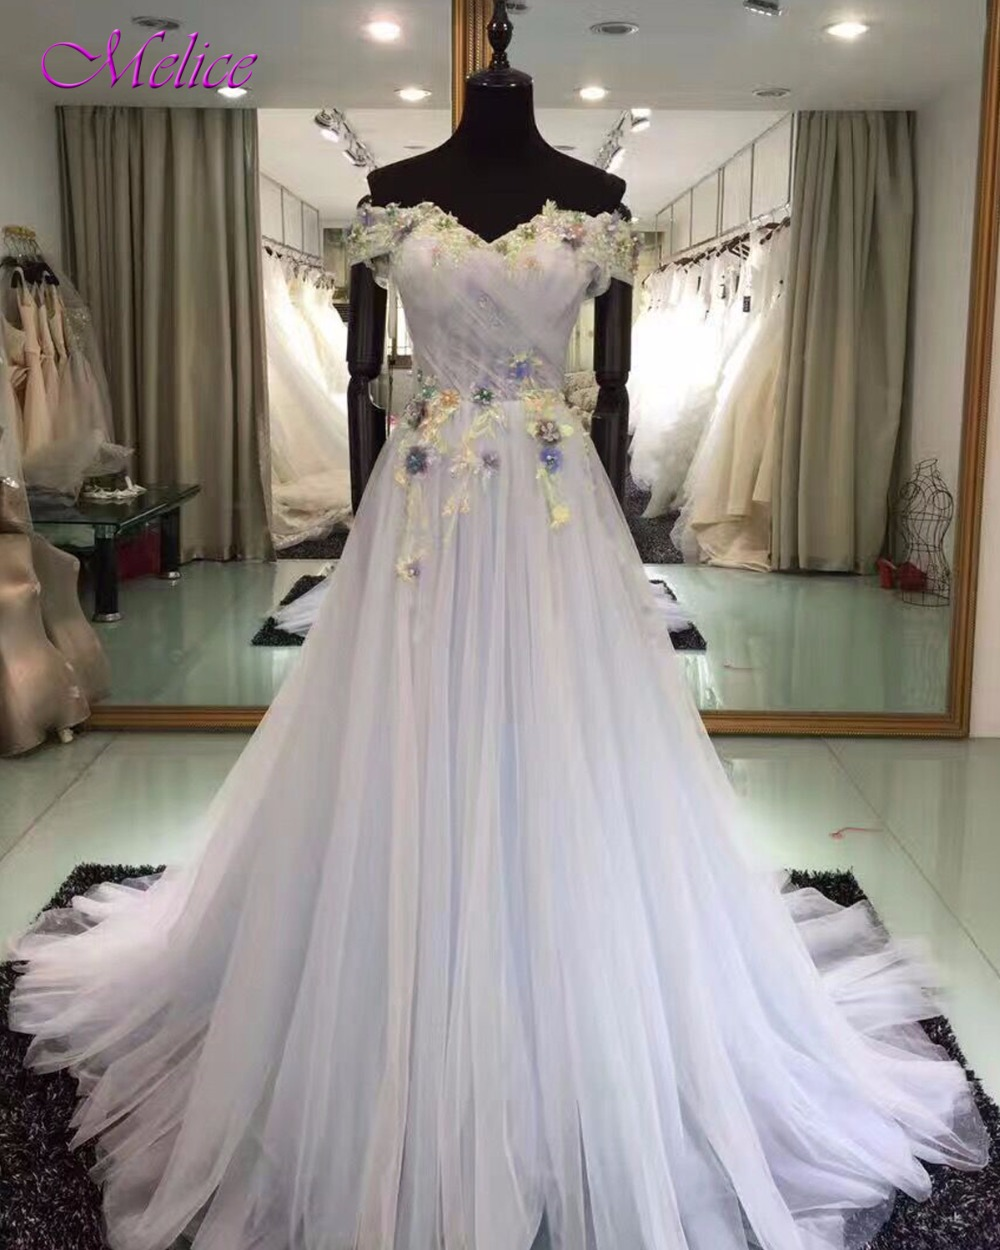 Melice Boat Neck Appliques Beaded Lace Up A-Line   Prom     Dresses   2019 Graceful Tulle Pleated Party Gown Vestido de Festa Plus Size